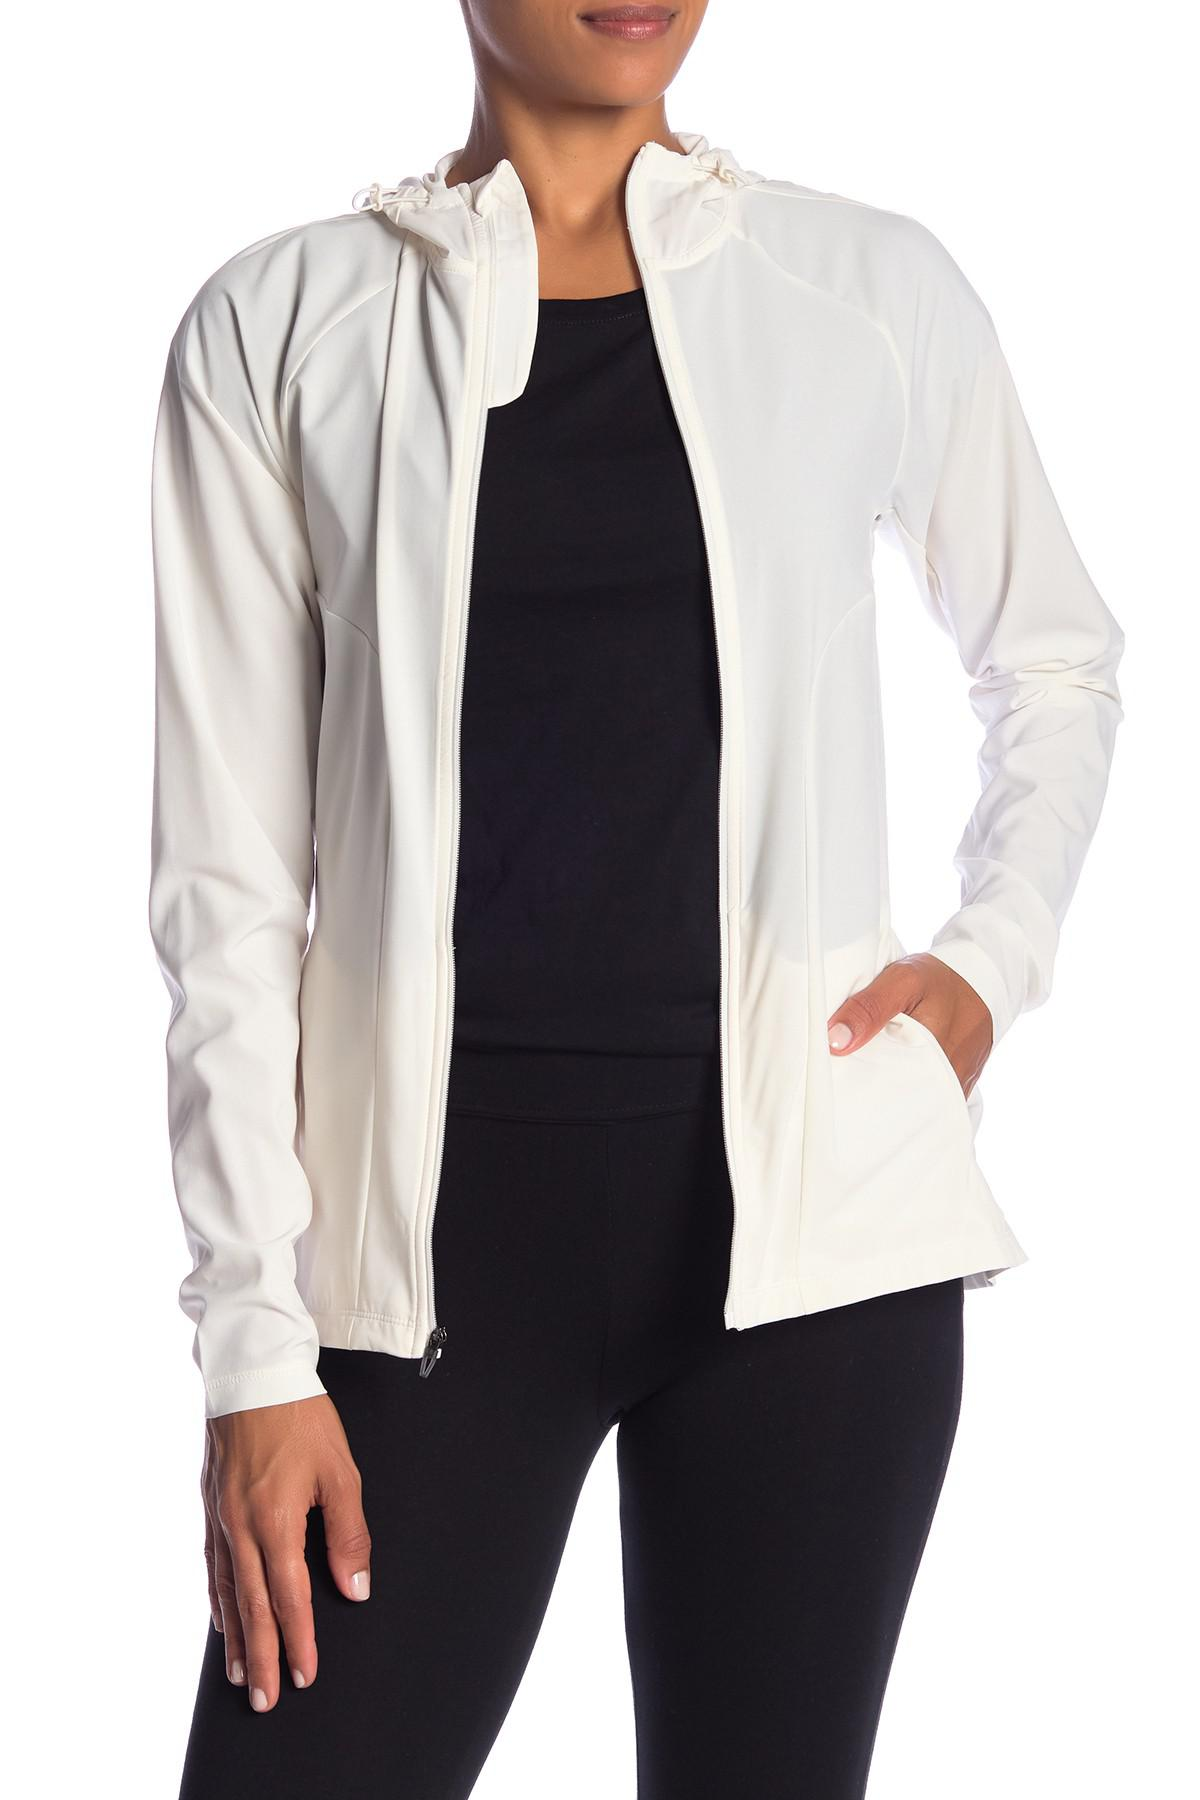 2b73eb2831cb Lyst - adidas Freelift Woven Jacket